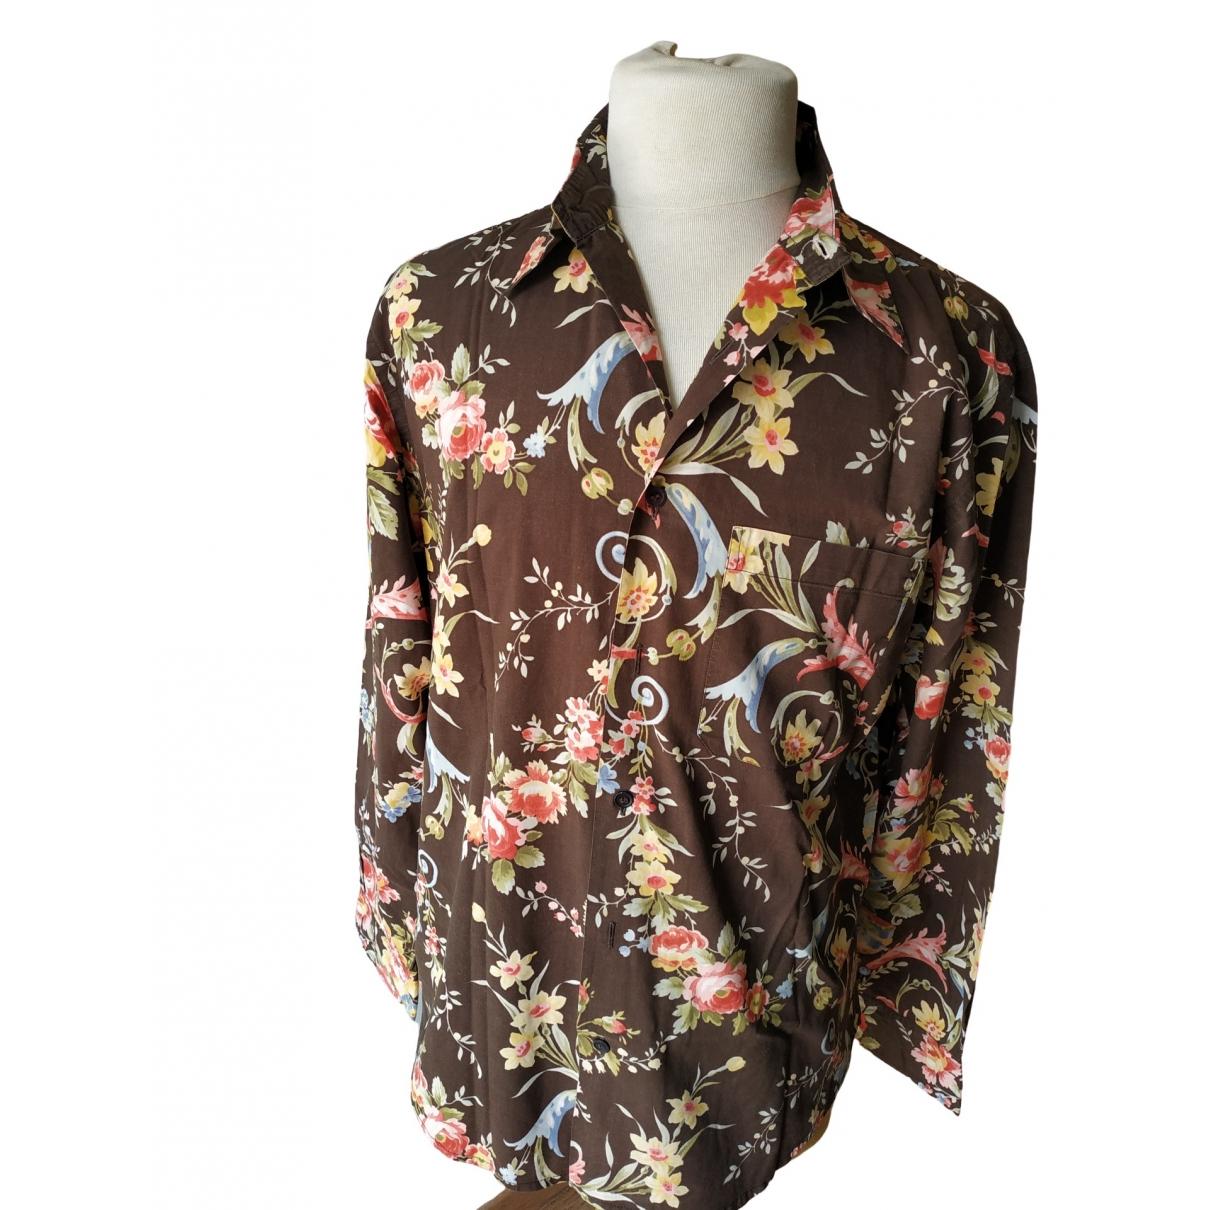 Paul Smith \N Multicolour Cotton Shirts for Men S International